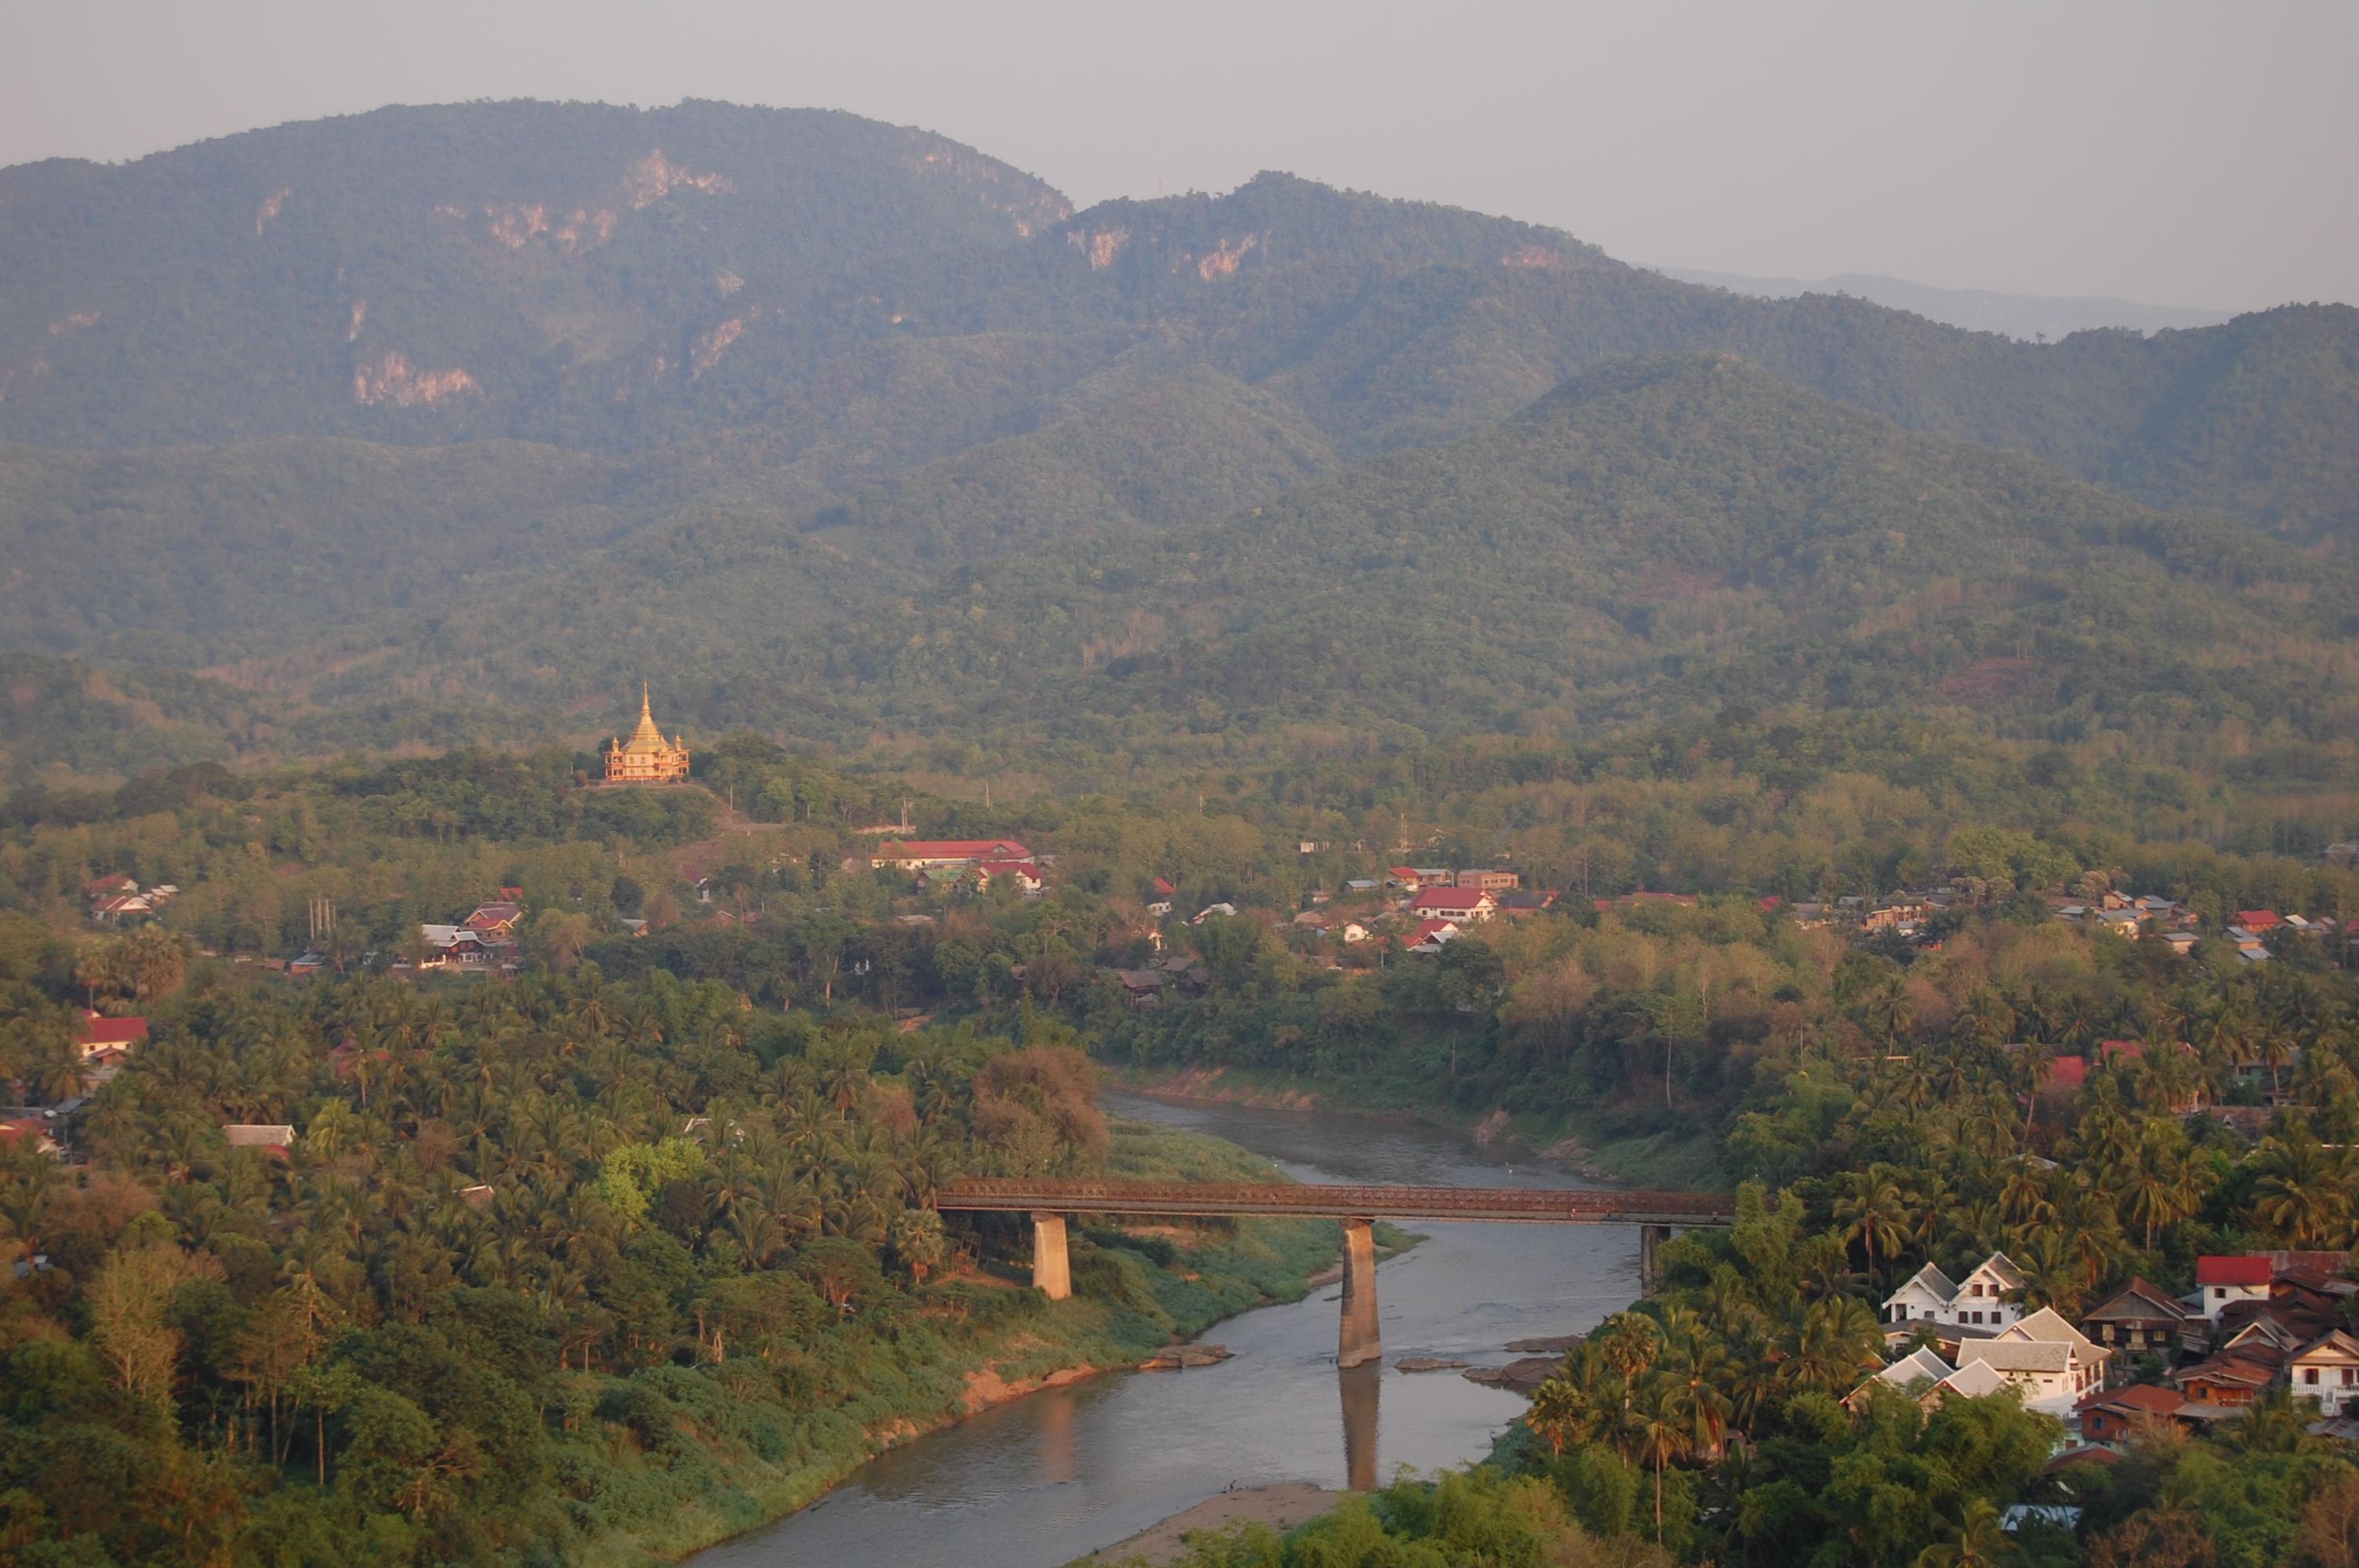 Mount Phousi, laos, luang prabang